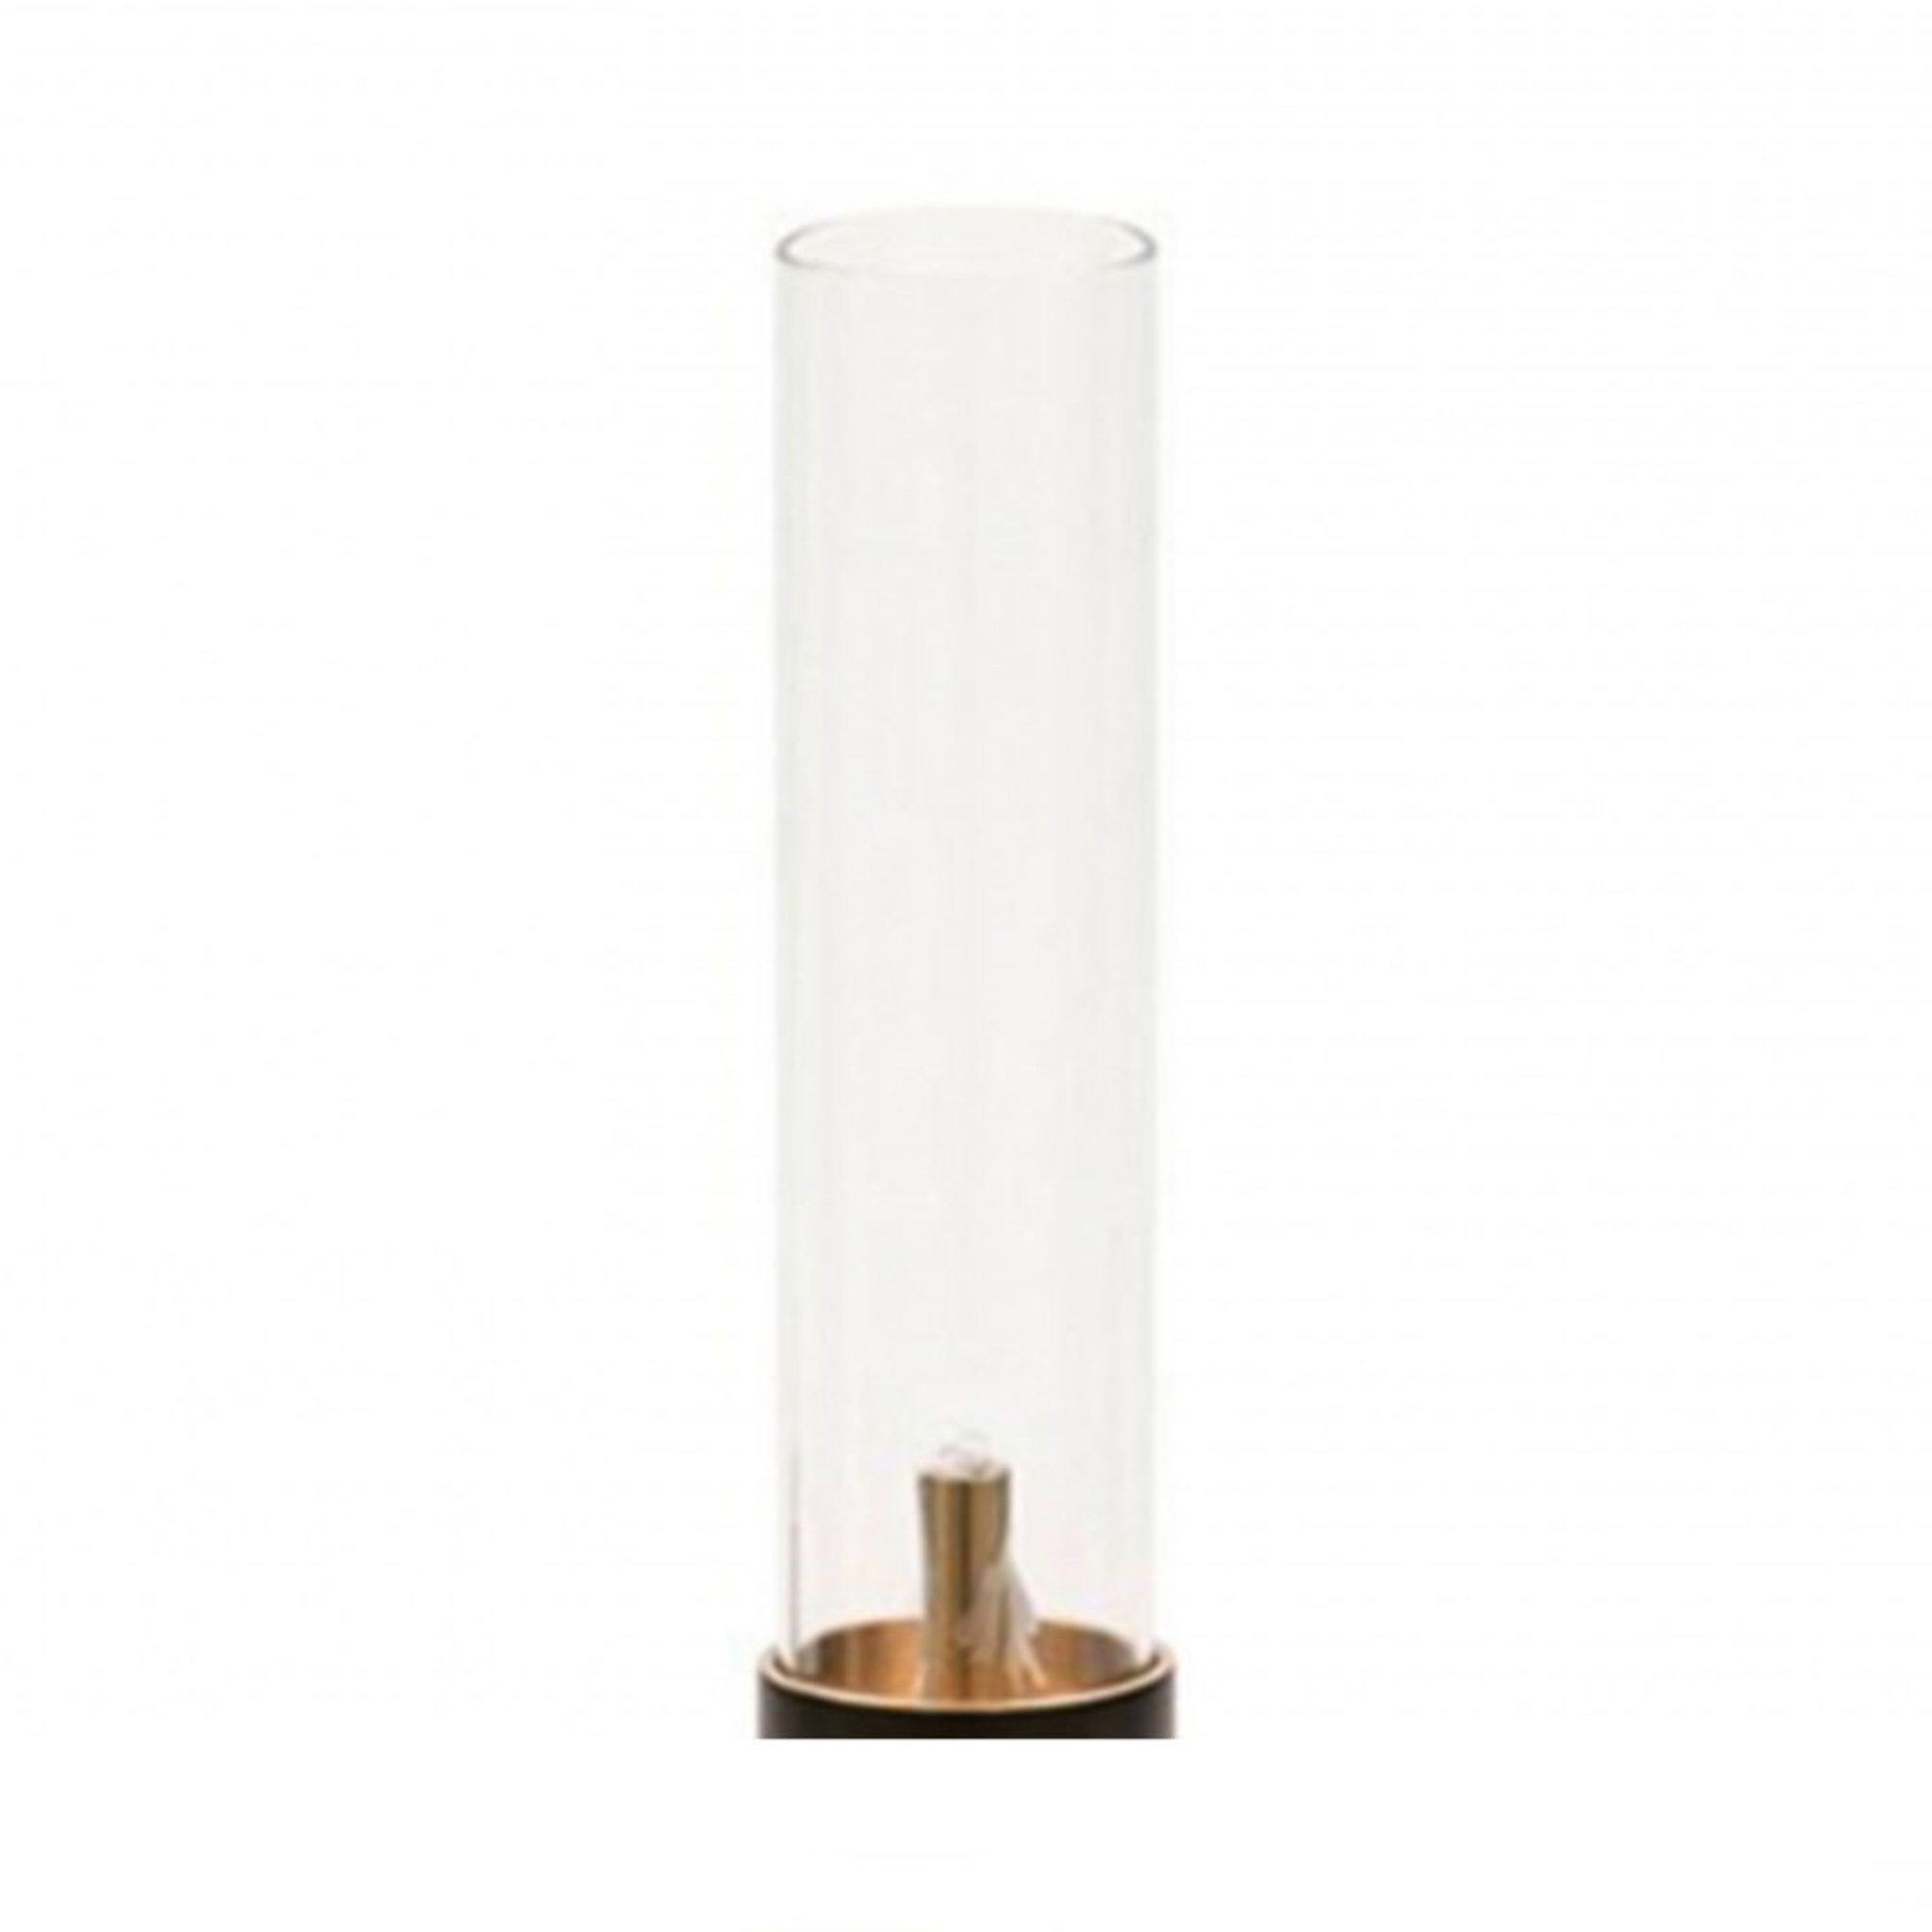 Glascylinder till Patina oljelampa, 4x16 cm thumbnail